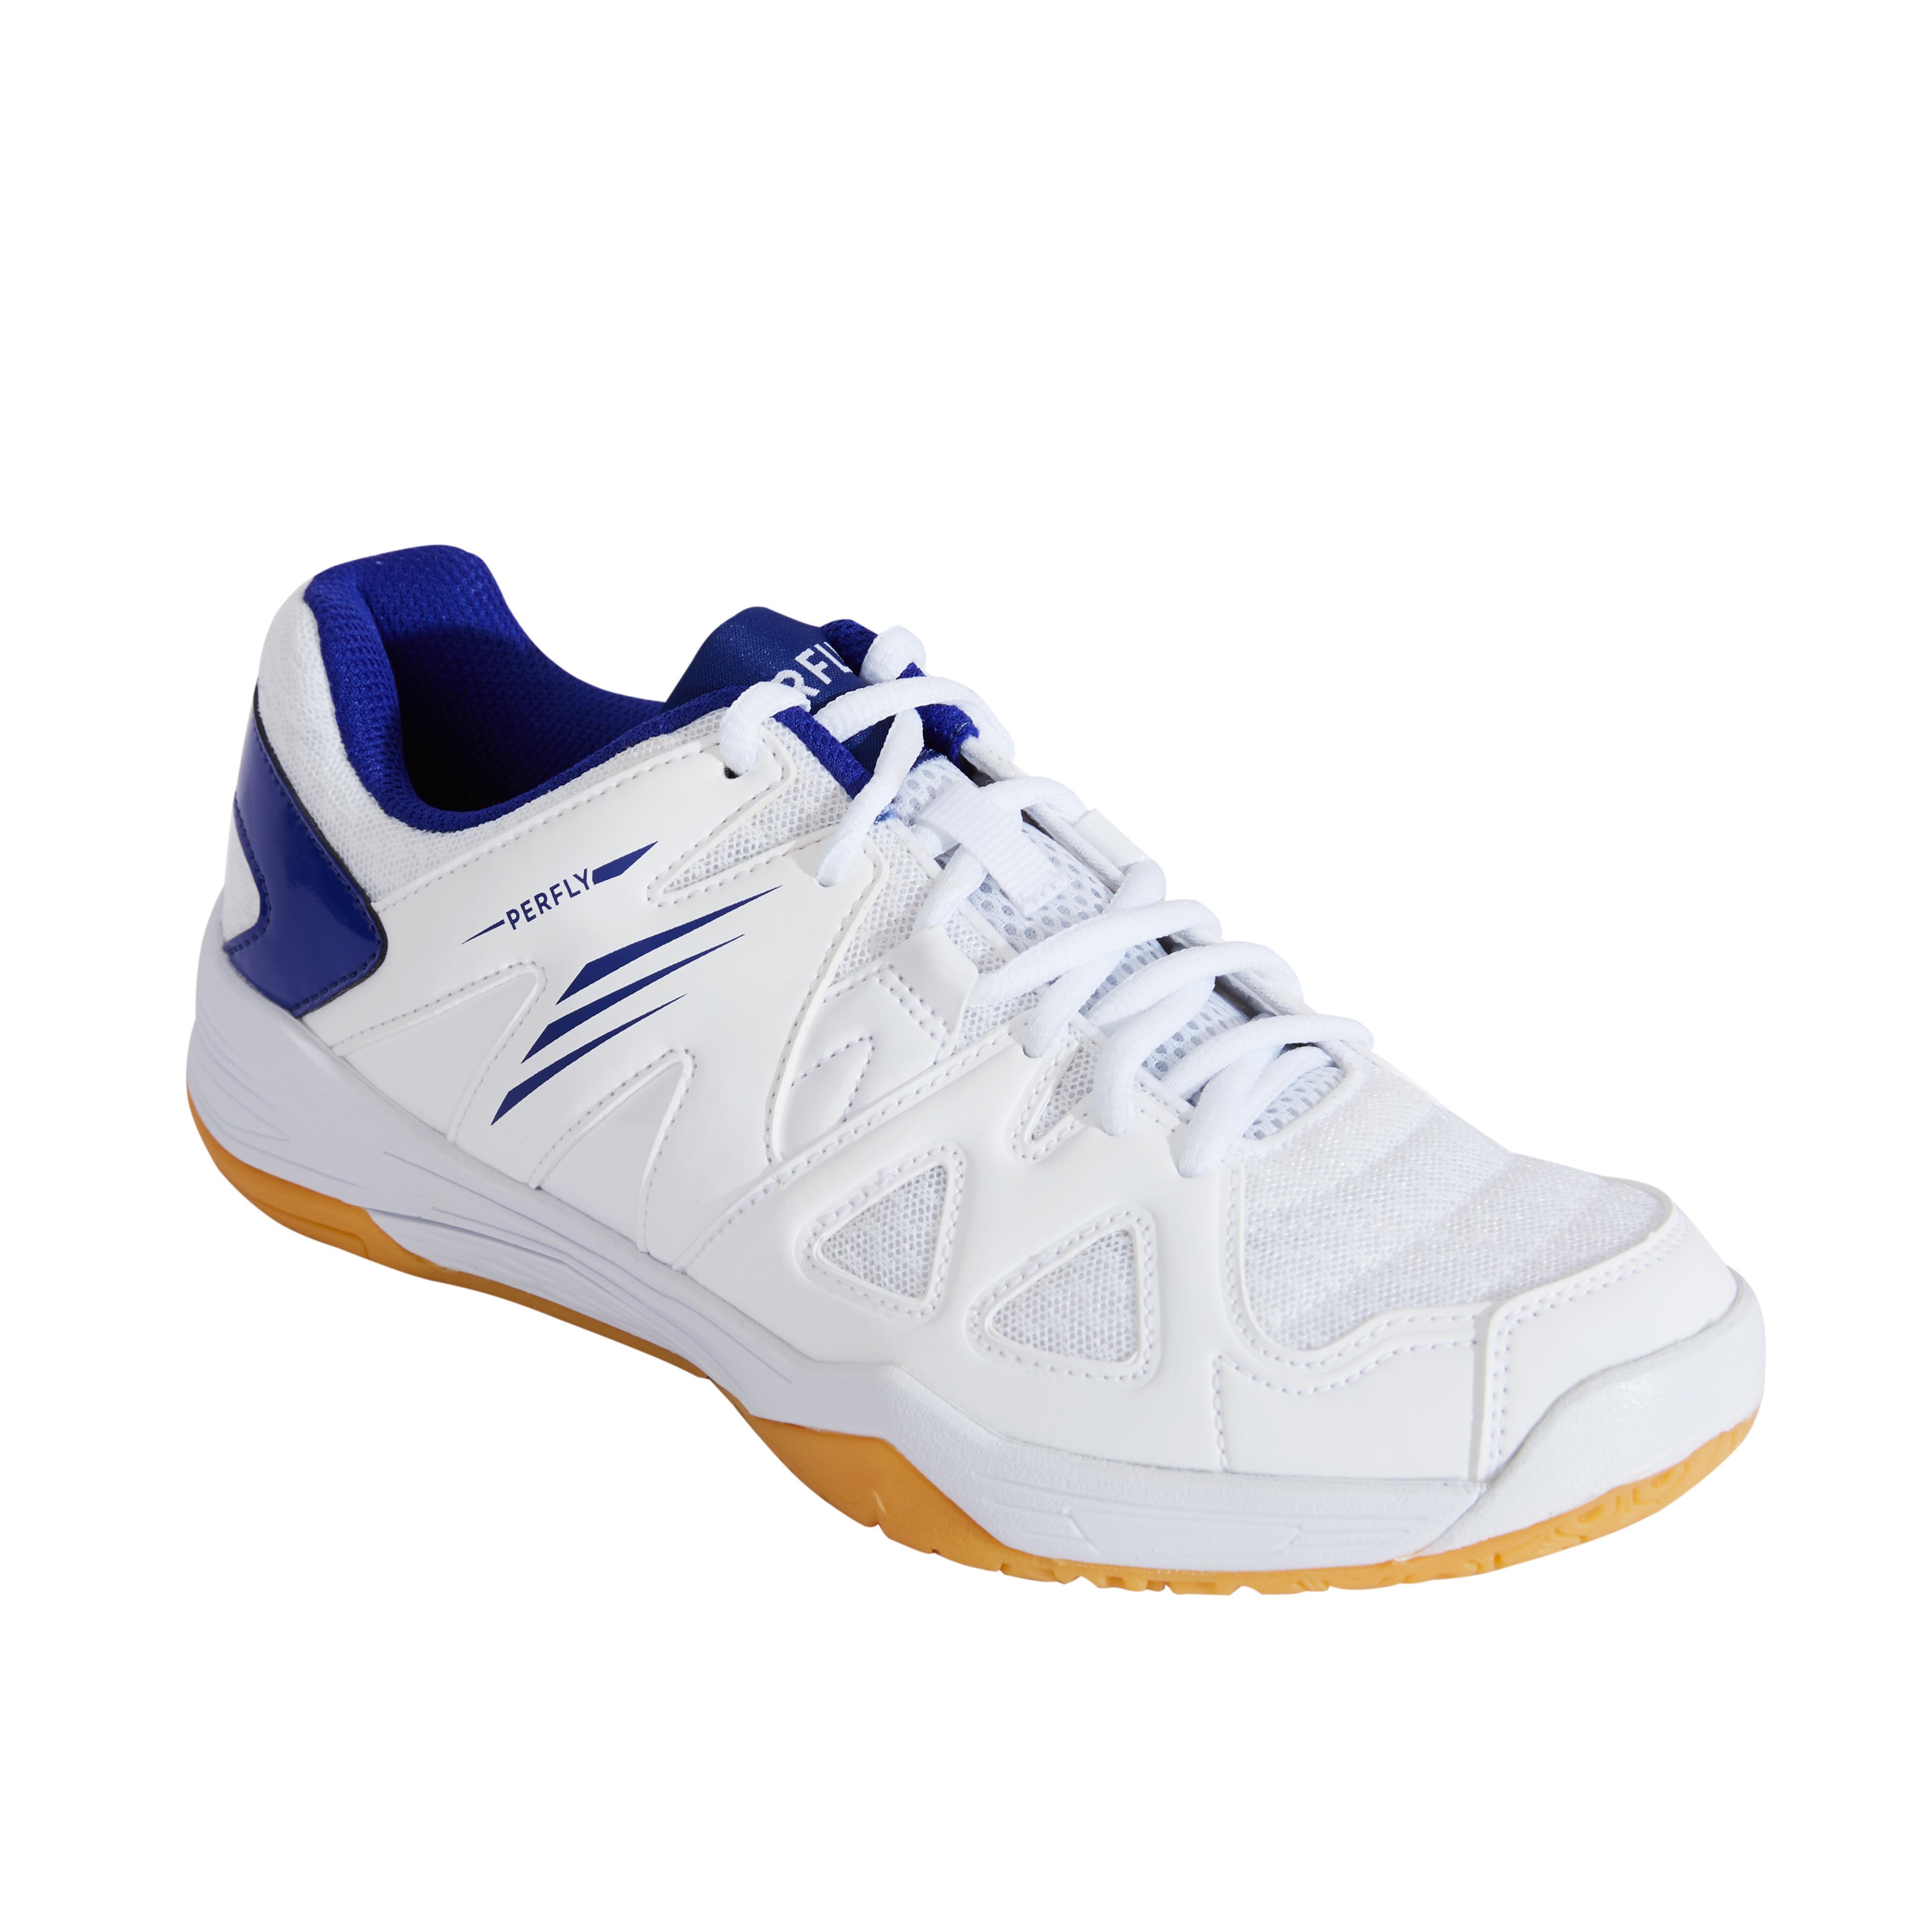 PERFLY Chaussures De Badminton Femme BS530 - Blanc/Bleu - PERFLY - 40